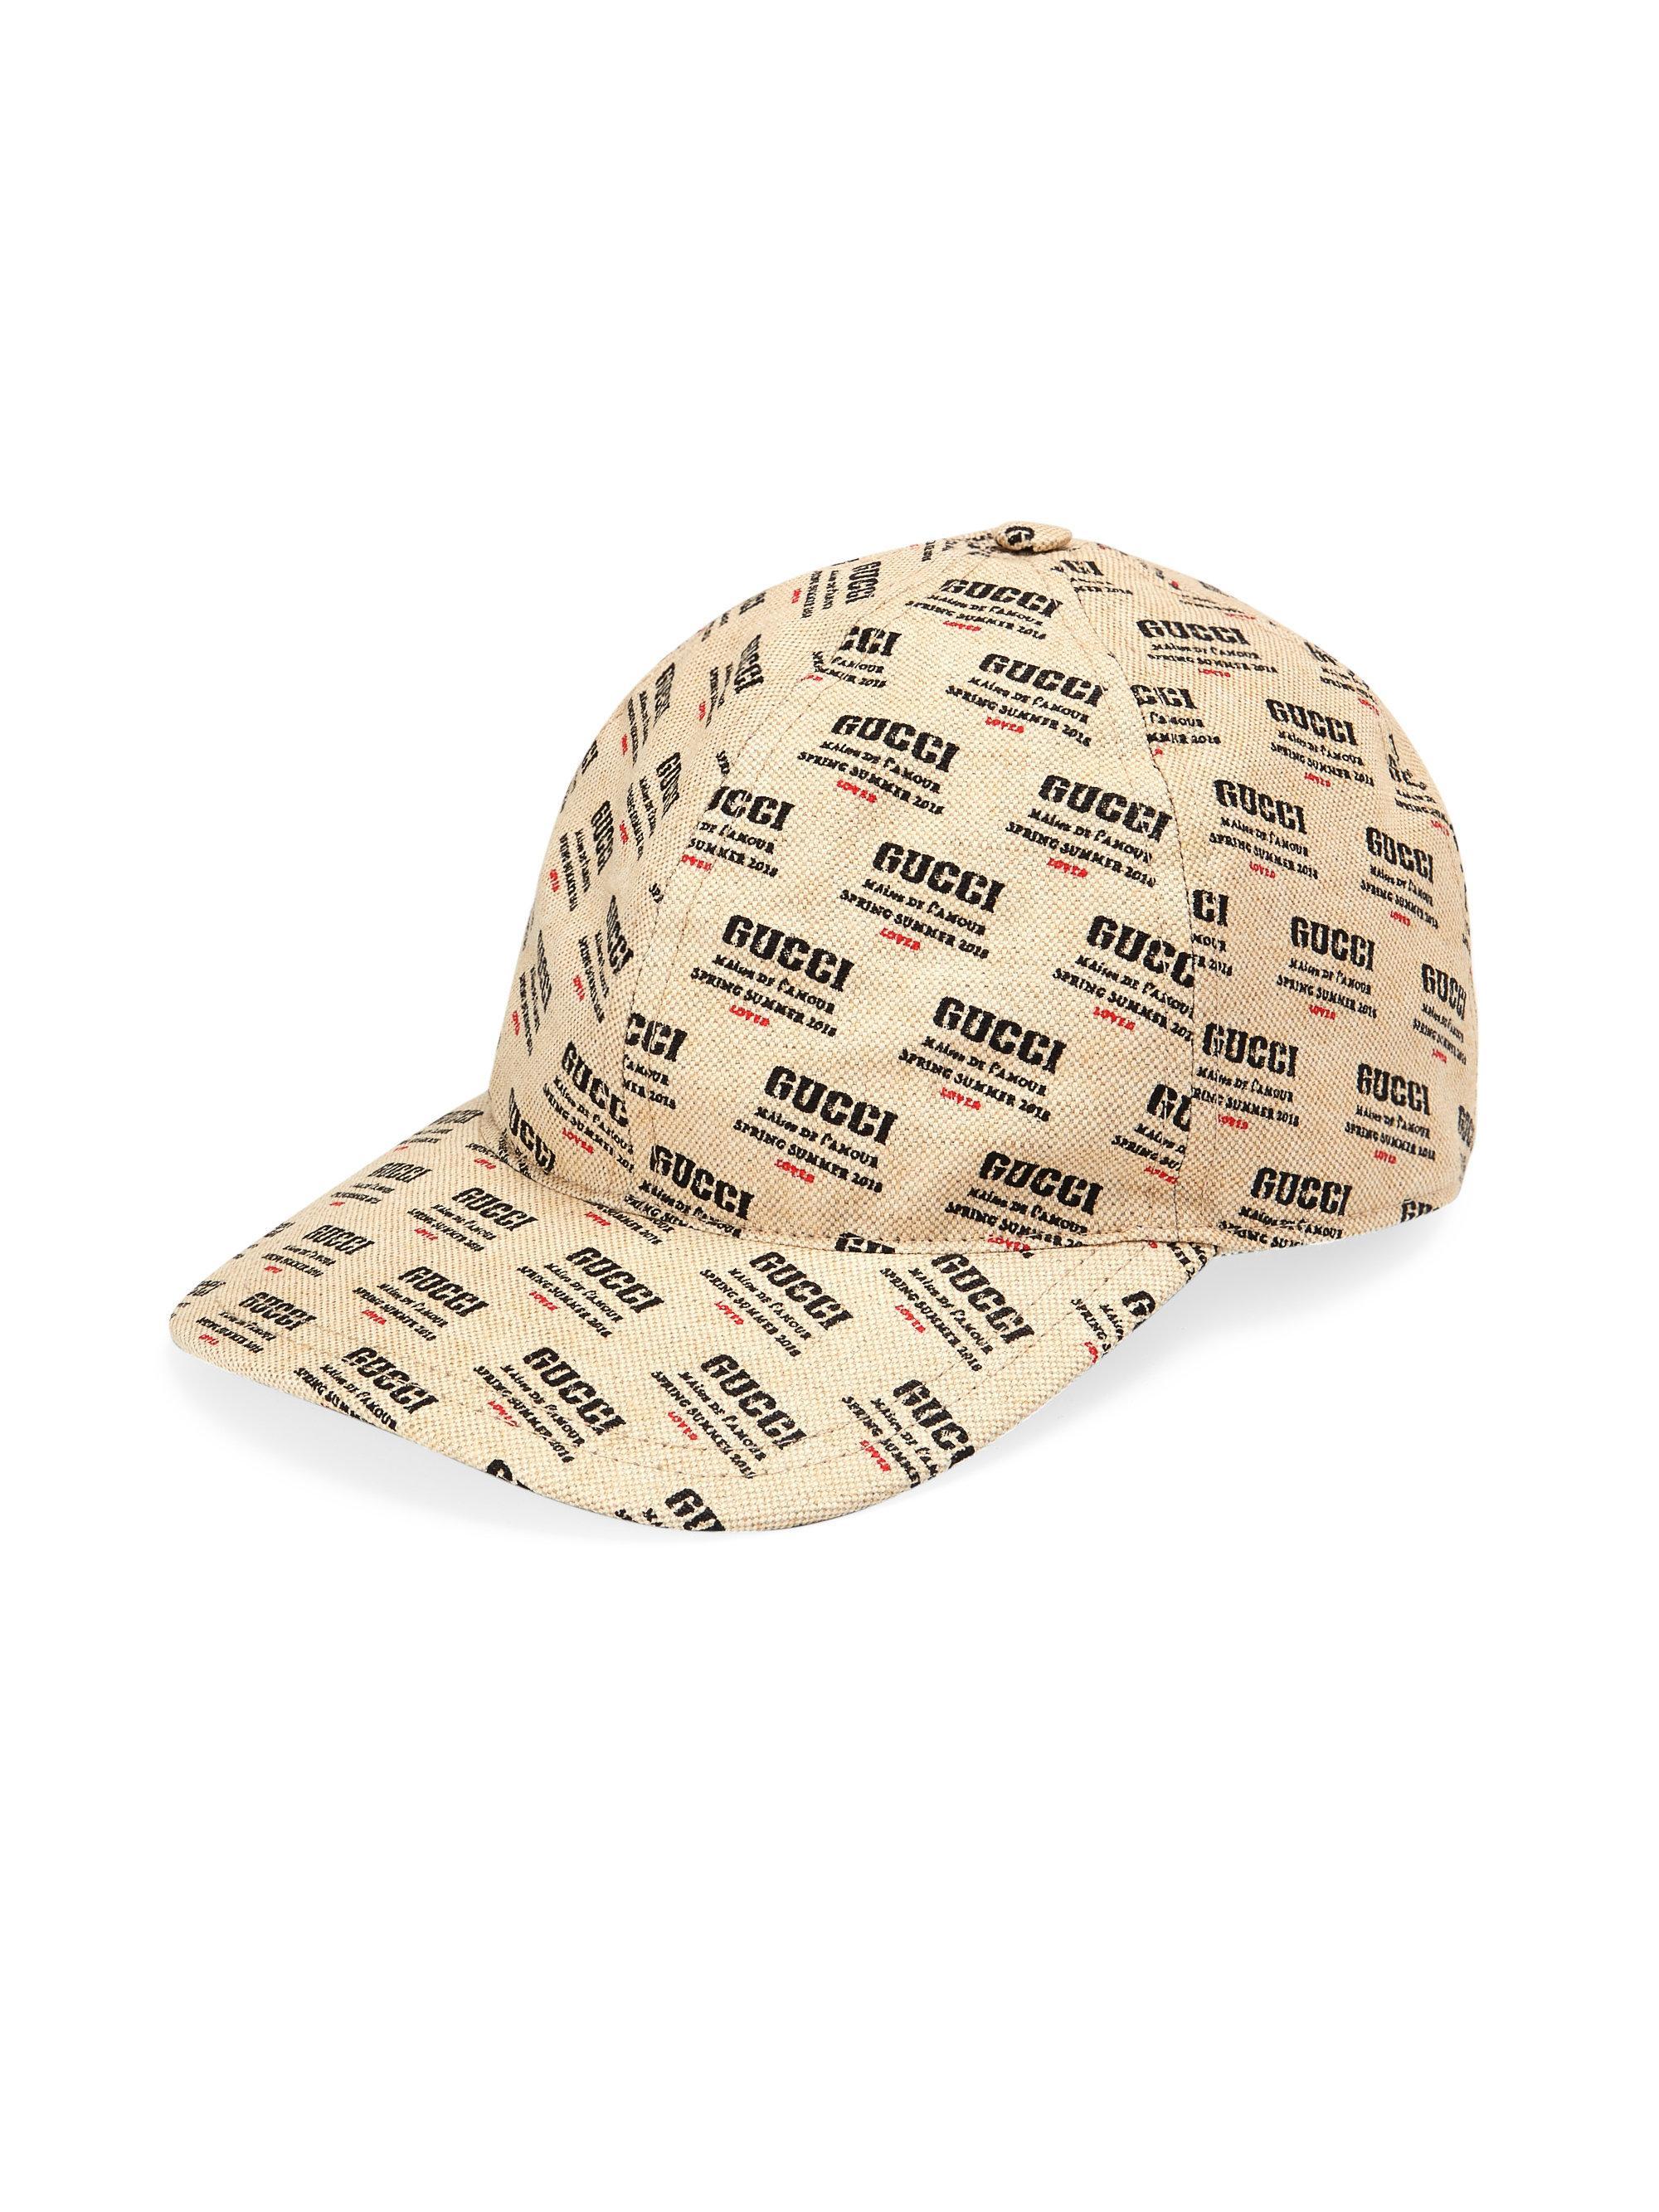 Lyst - Gucci Logo Invite Print Canvas Baseball Hat in Red for Men 6fc5e1a5490